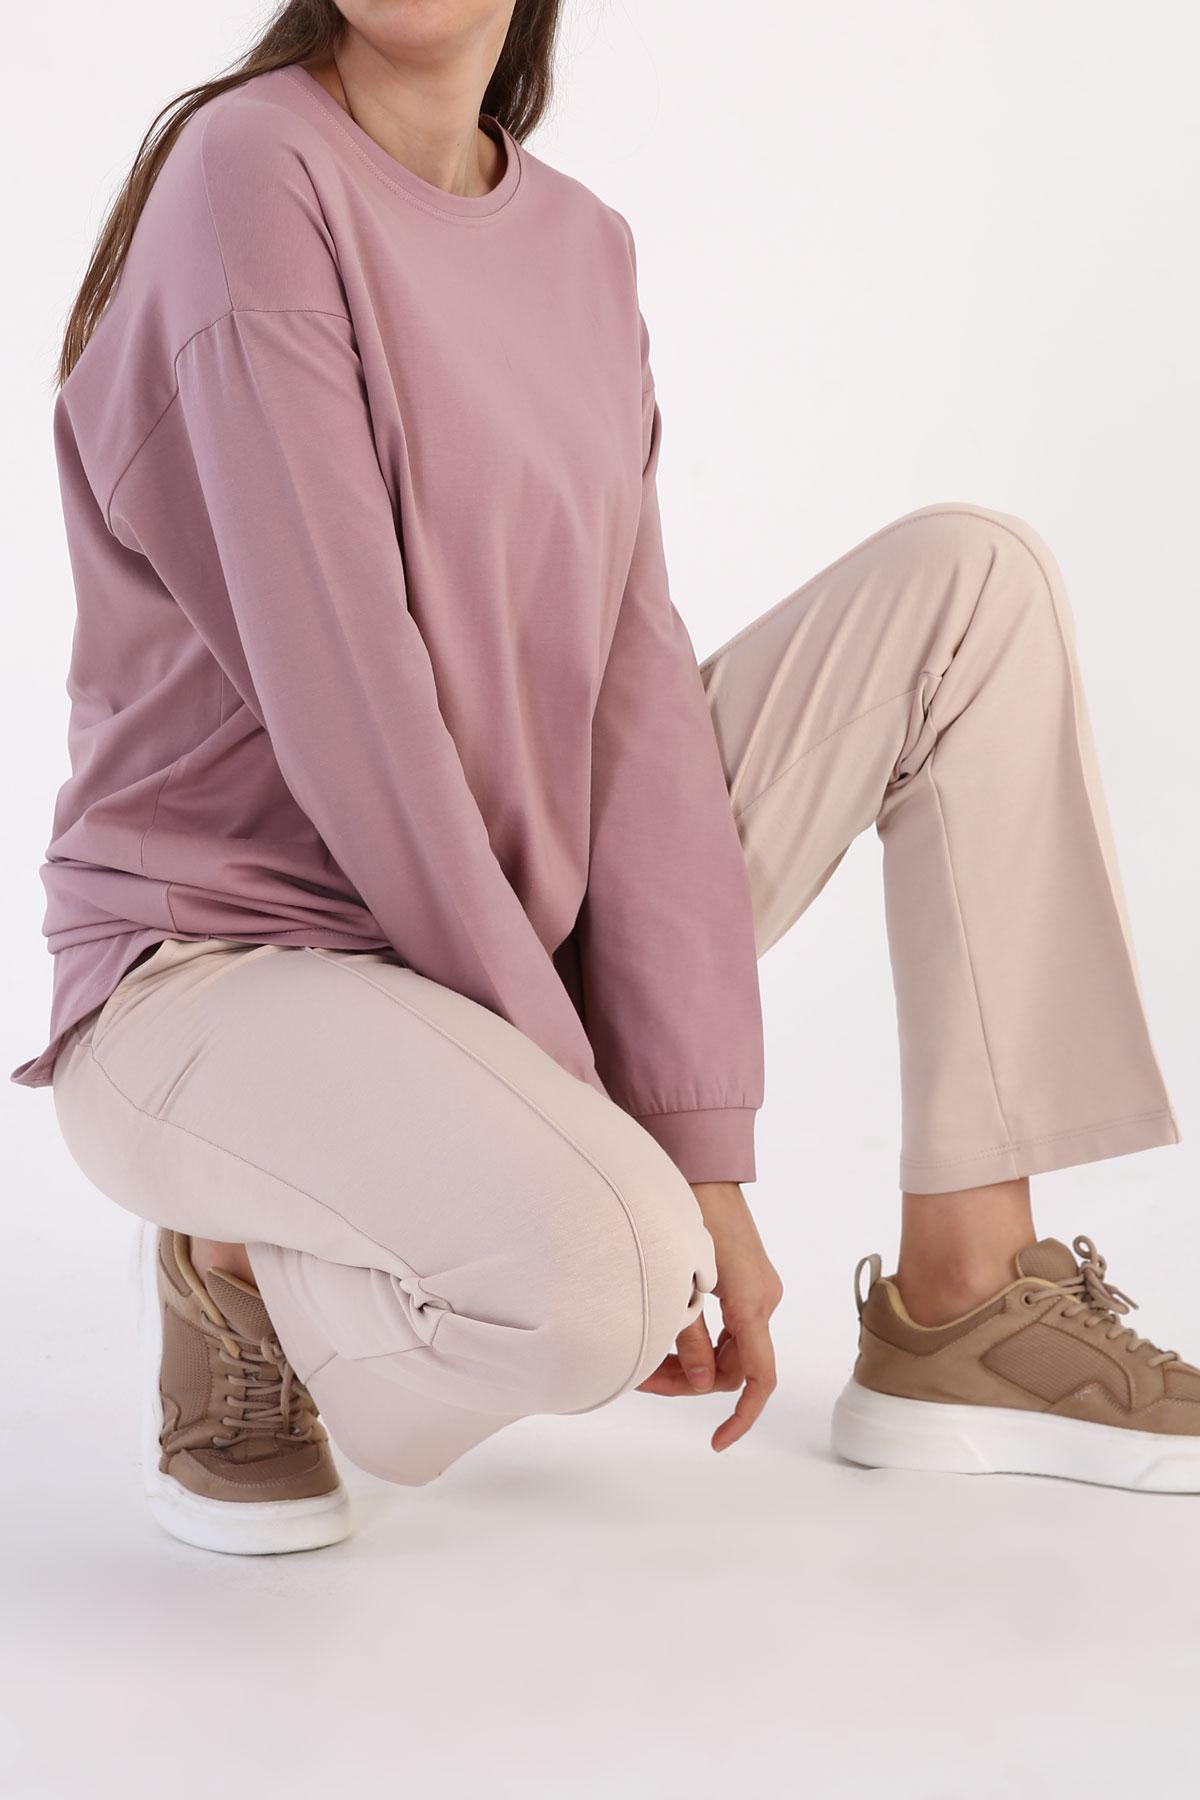 Comfy Sweatpants With Pocket